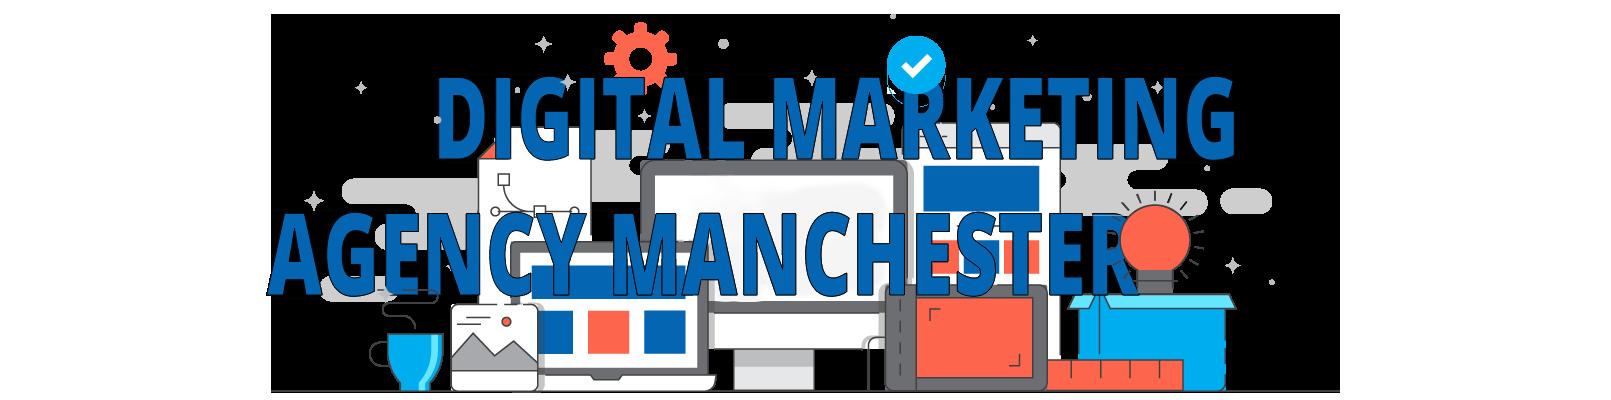 seek social digital marketing agency manchester header with transparent background